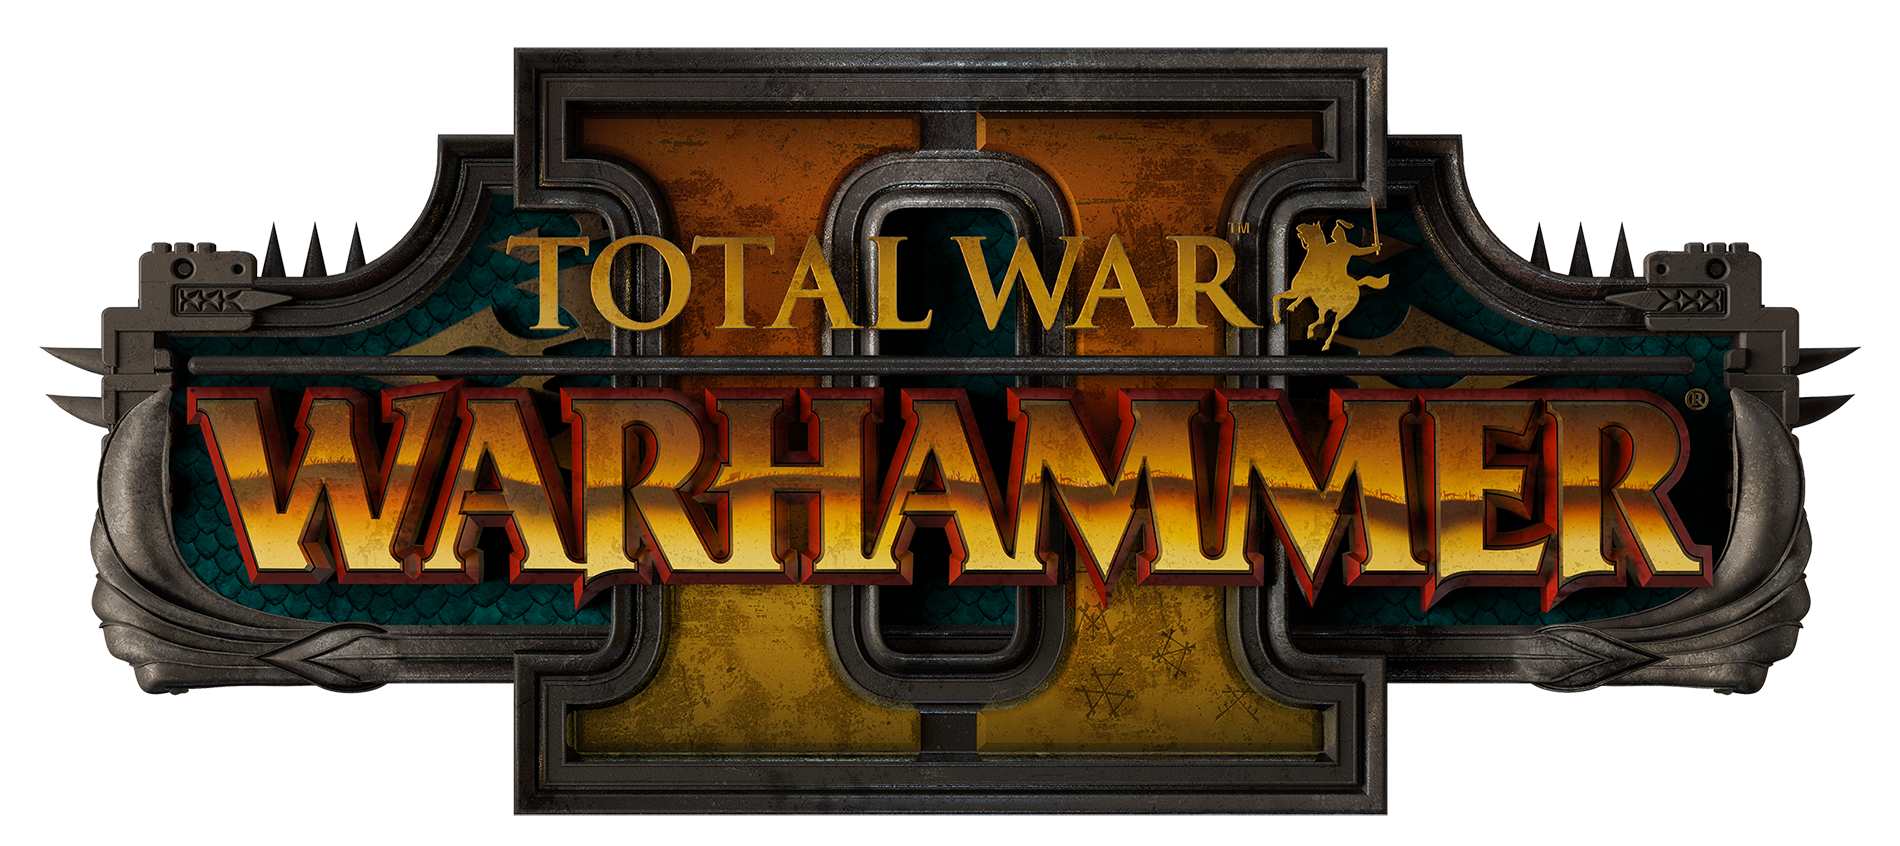 total war� warhammer174ii announced